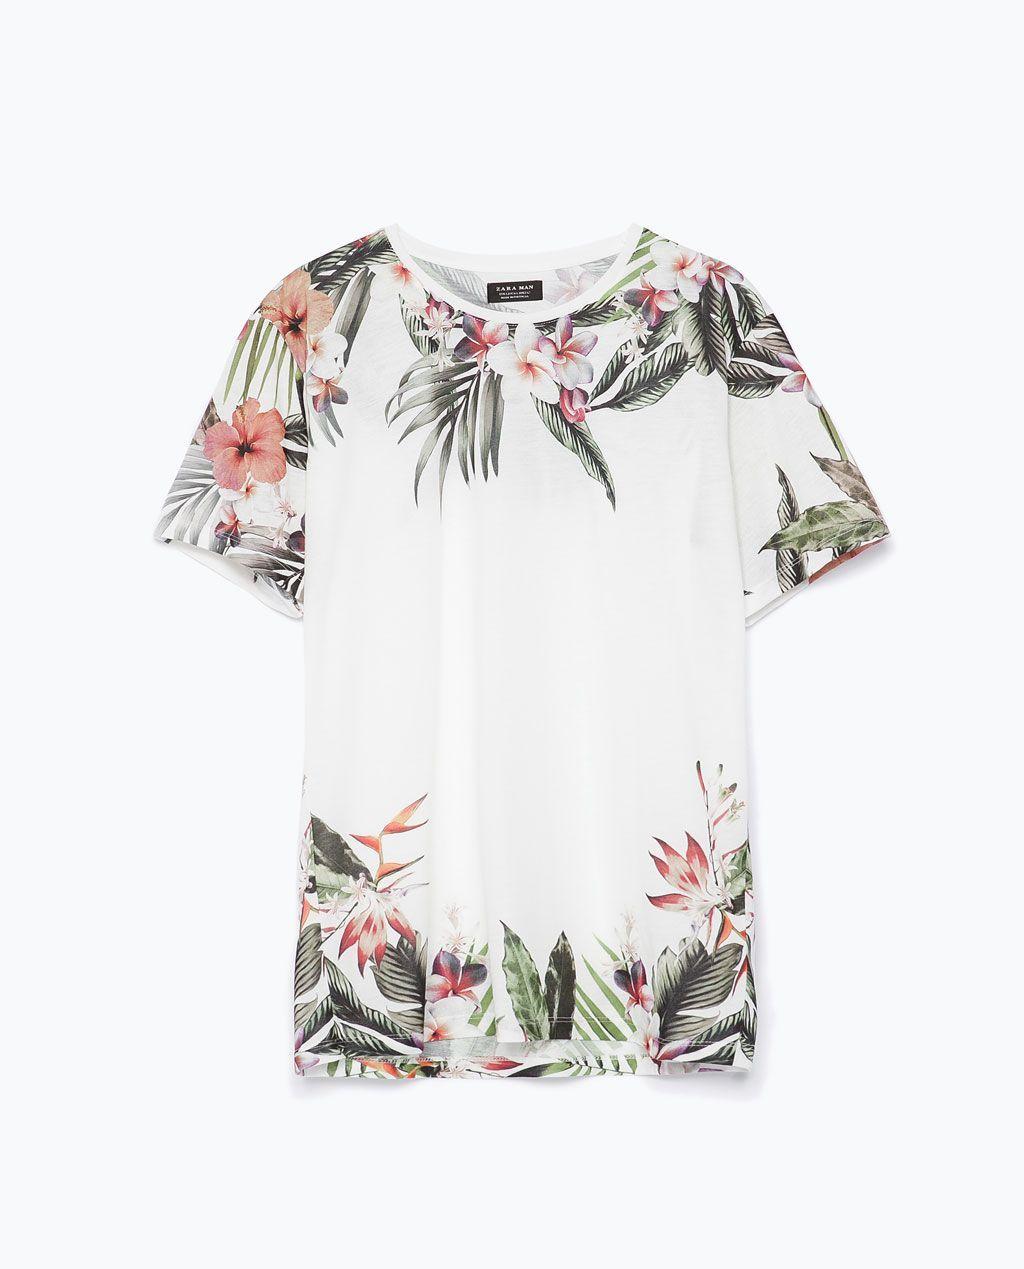 Zara flannel shirt mens  KOSZULKA W KWIATY  ZARA Polska  Mens Tshirts  Pinterest